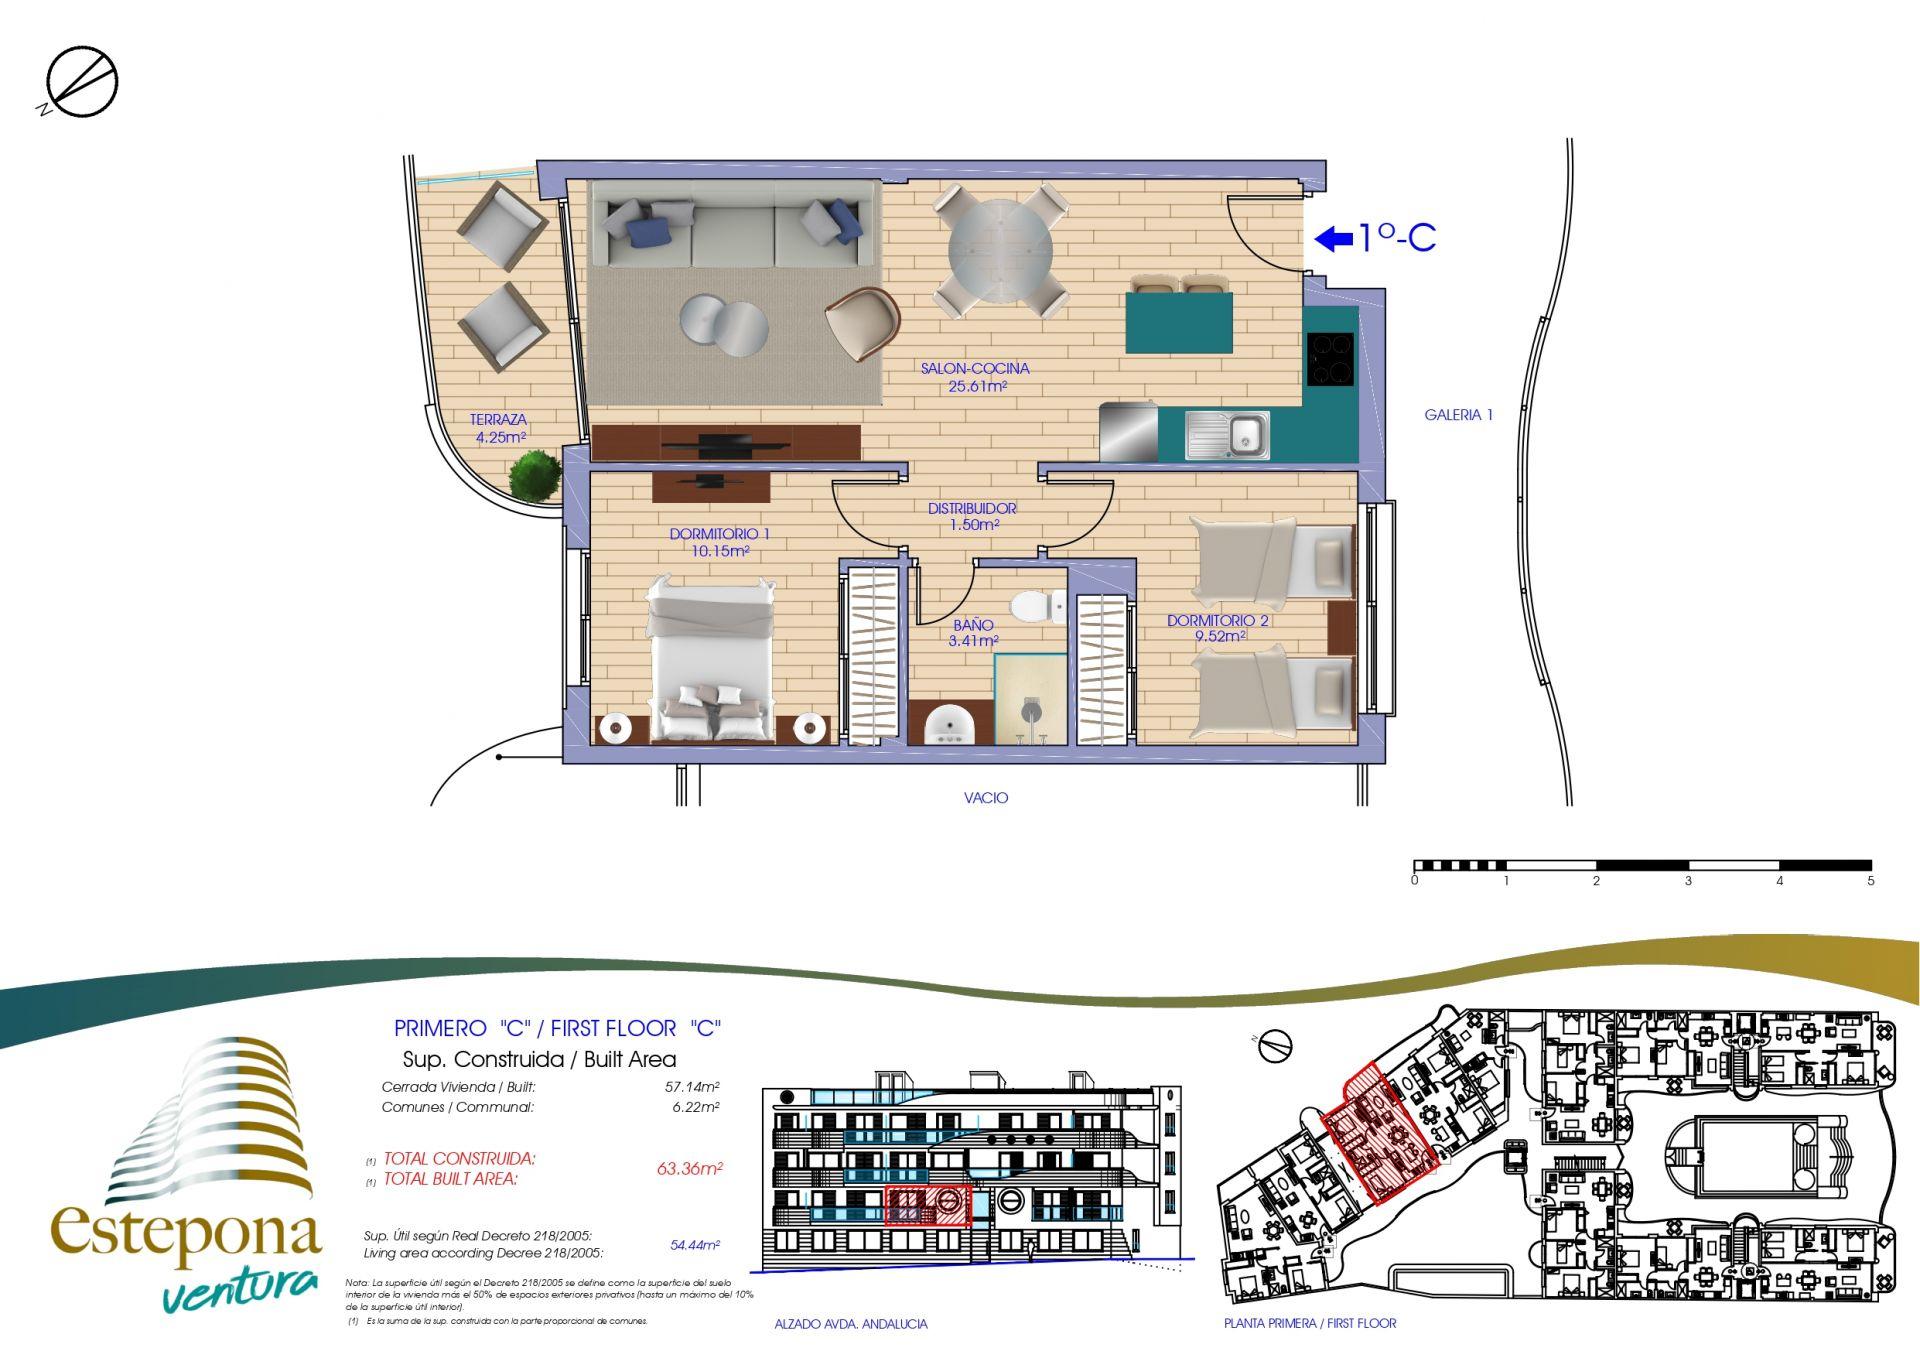 1c - Ventura Estepona | Compra de casa en Estepona